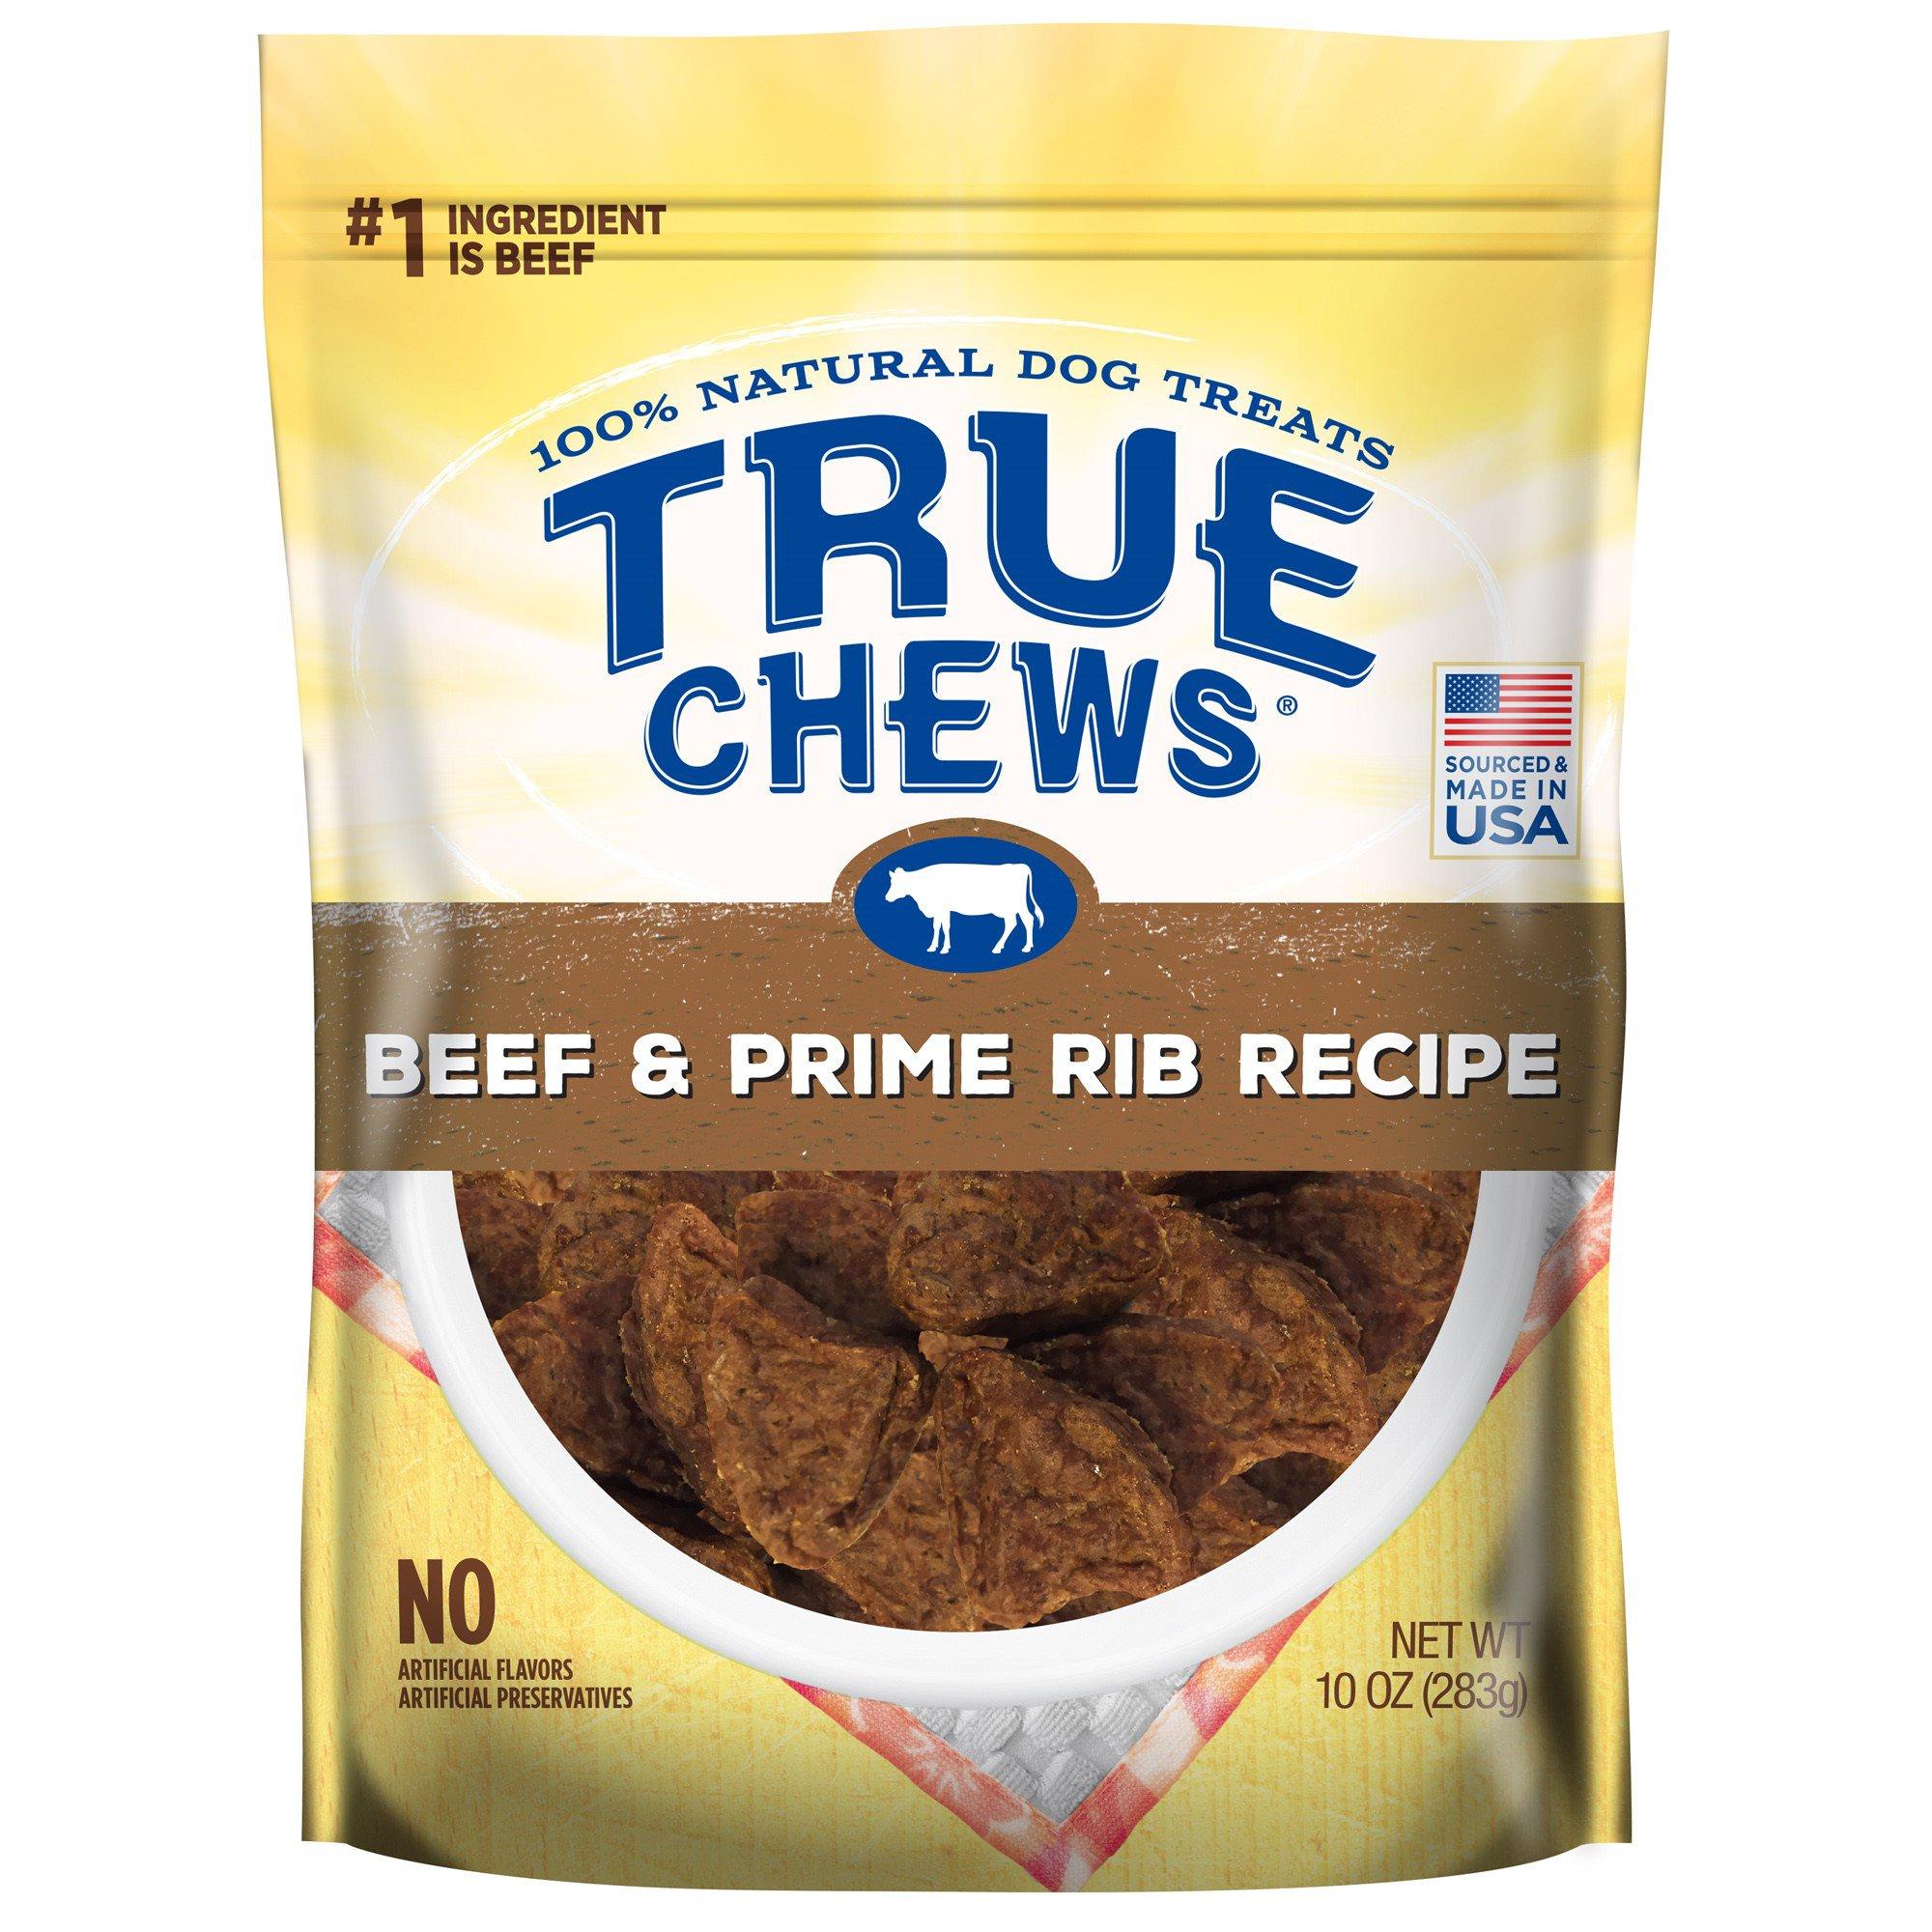 Image of True Chews Beef & Prime Rib Recipe Dog Treats, 10 oz.